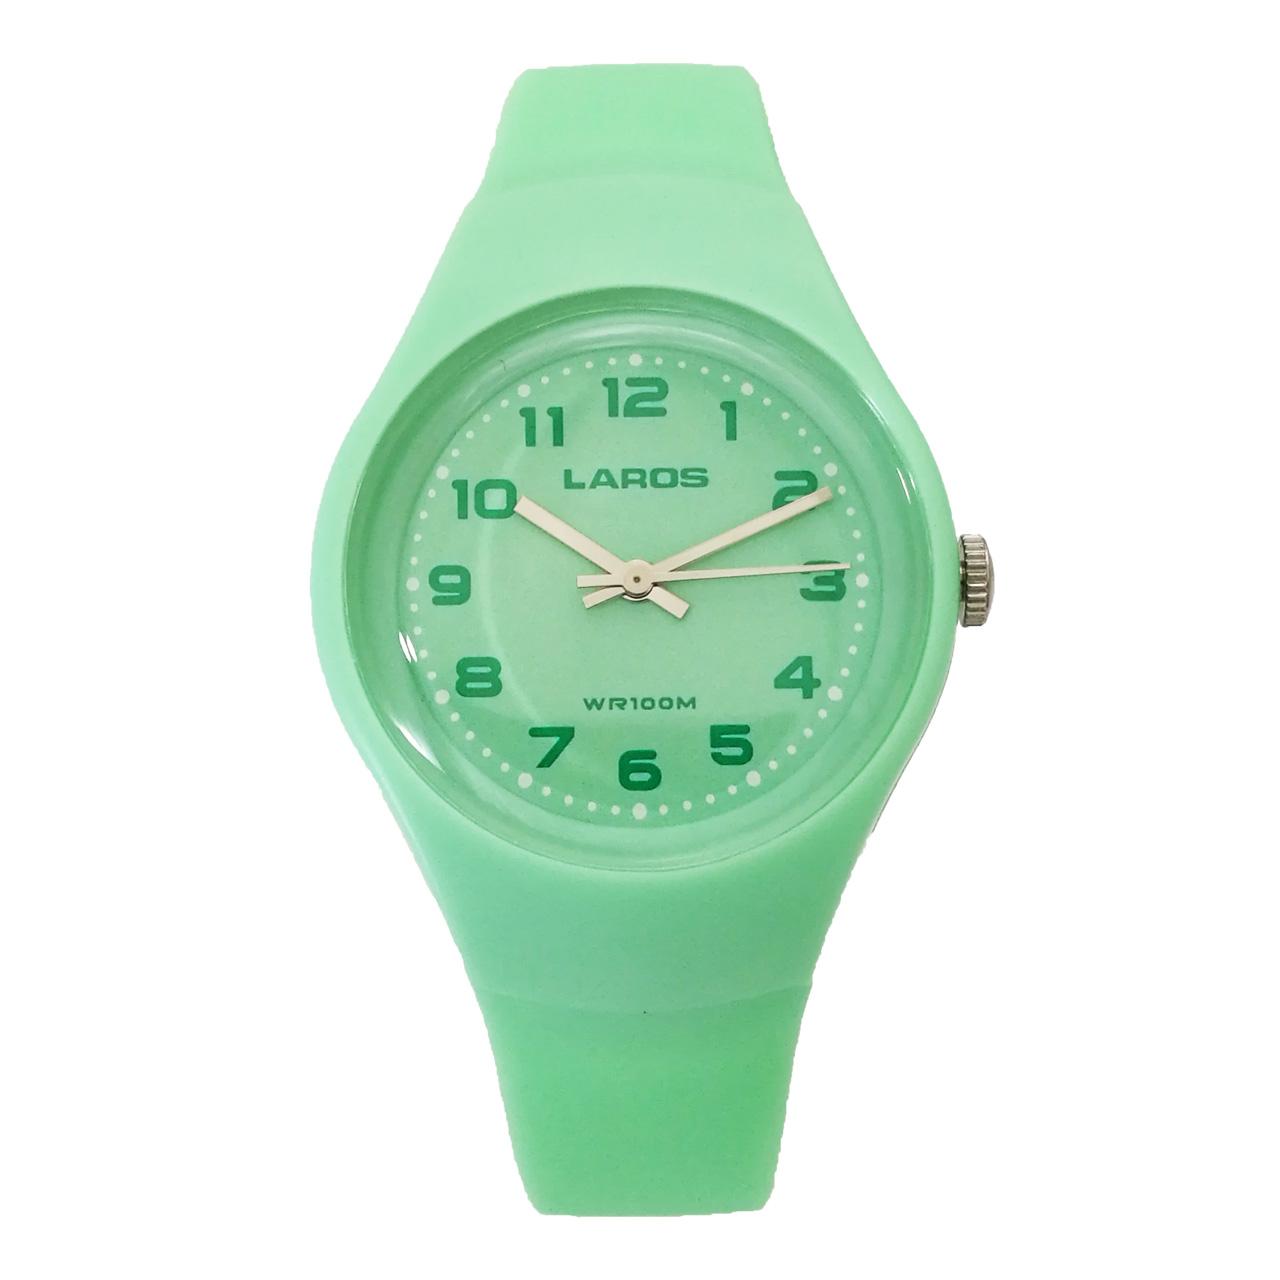 ساعت زنانه برند لاروس مدل 0917-aq1153